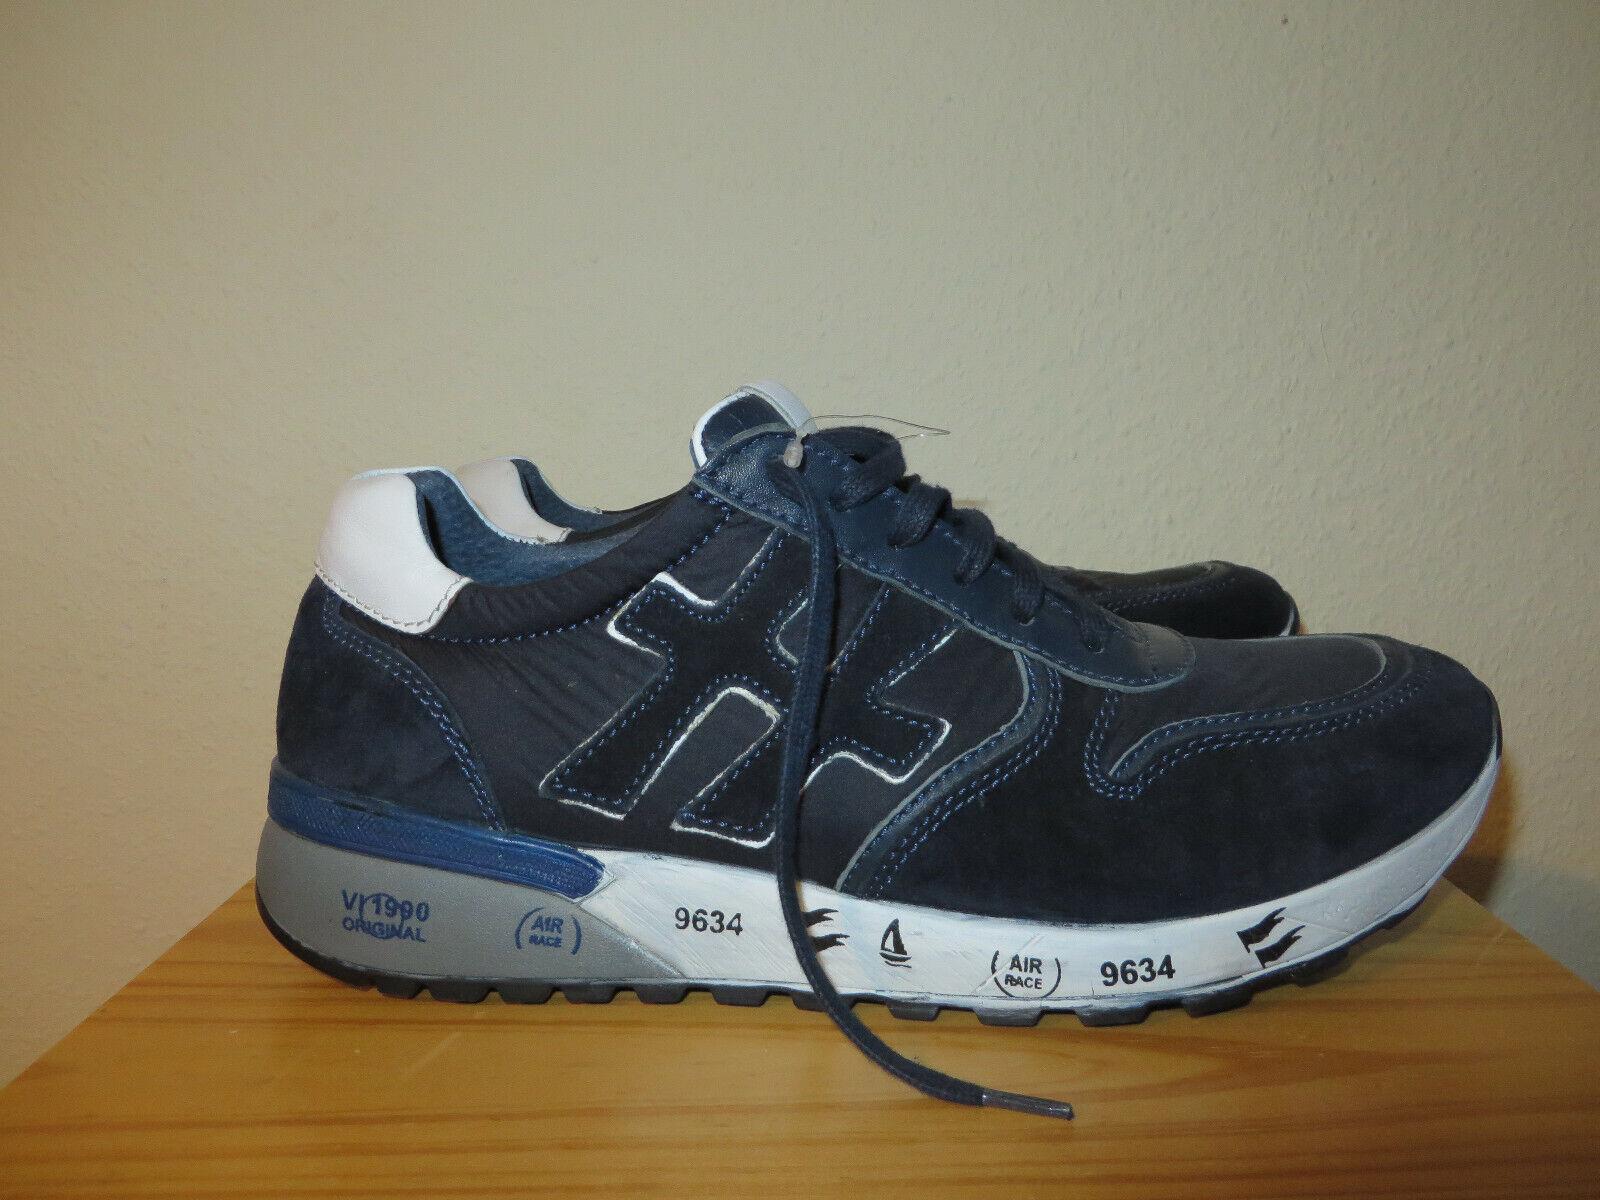 Rover & Lakes Herren Schuhe, Freizeitschuhe, Air Race 9634, Gr. 45